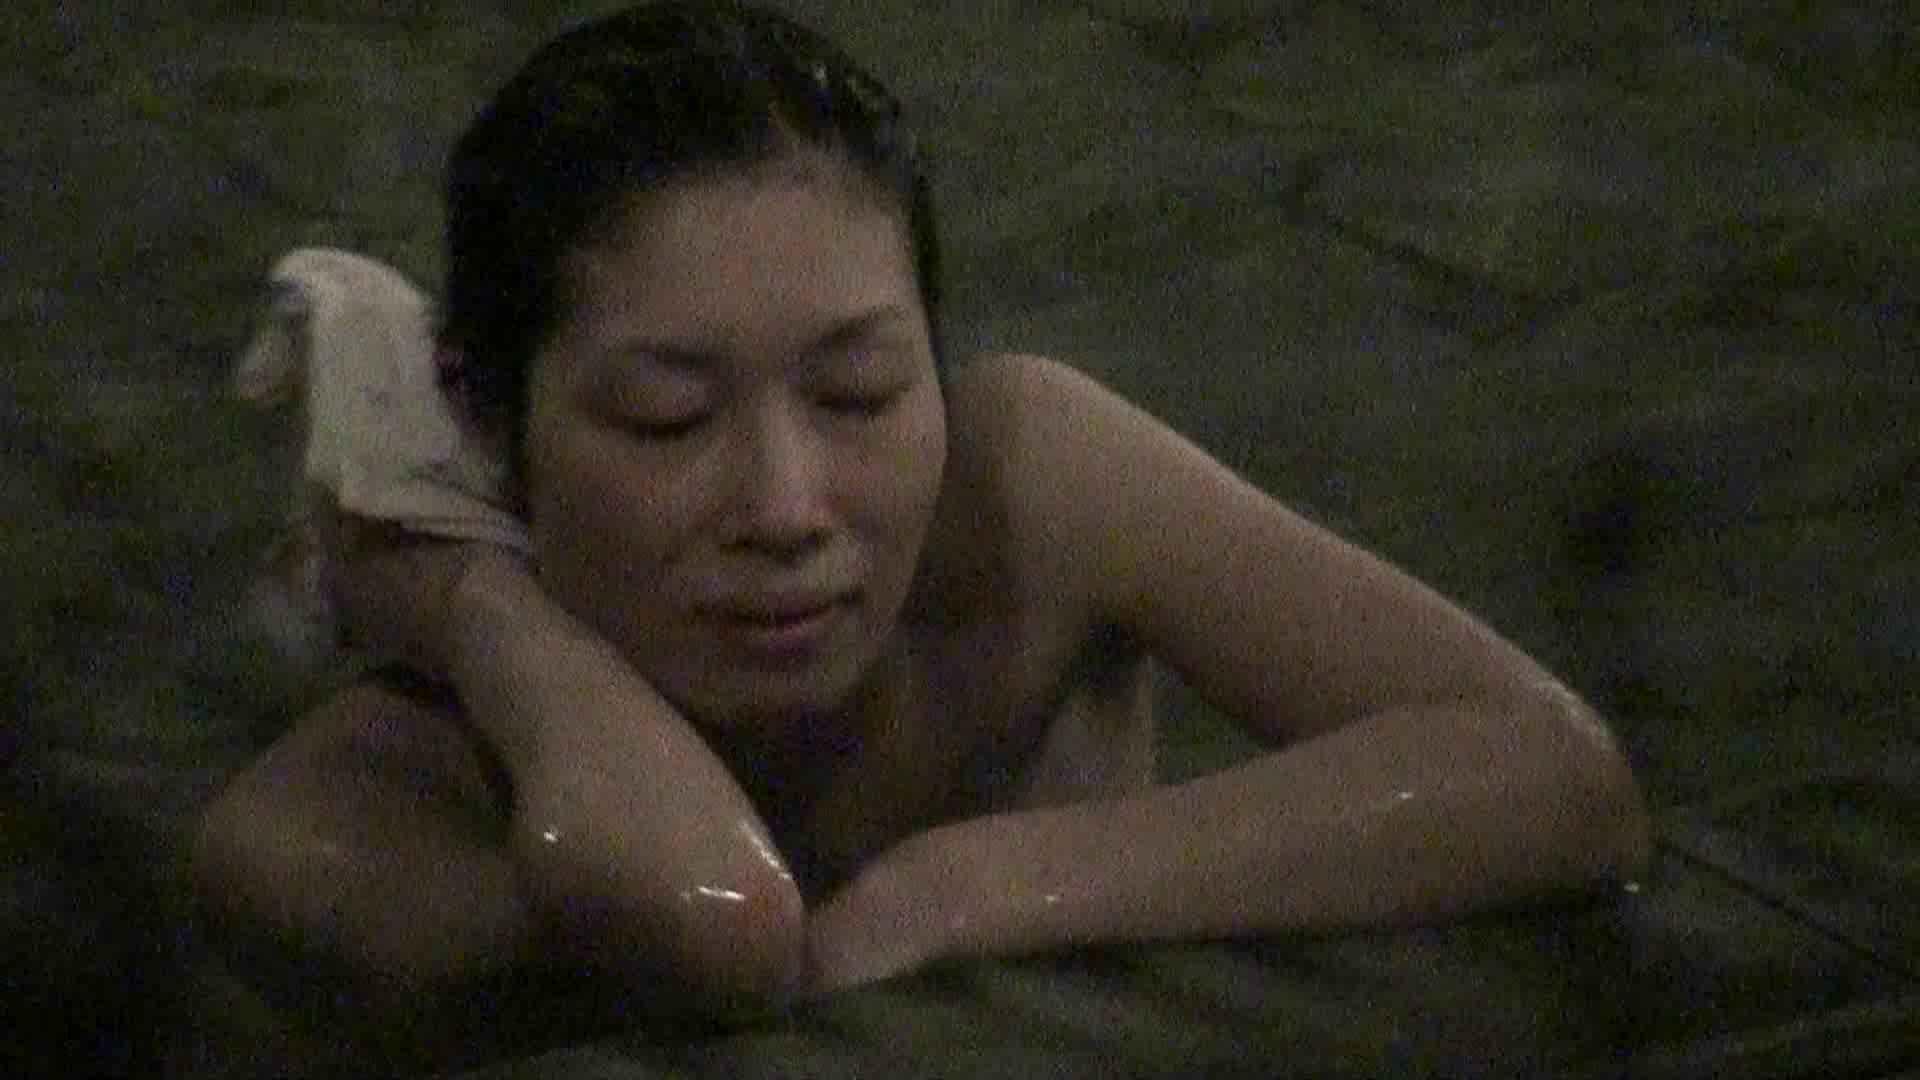 Aquaな露天風呂Vol.399 盗撮シリーズ | 露天風呂編  85PIX 7